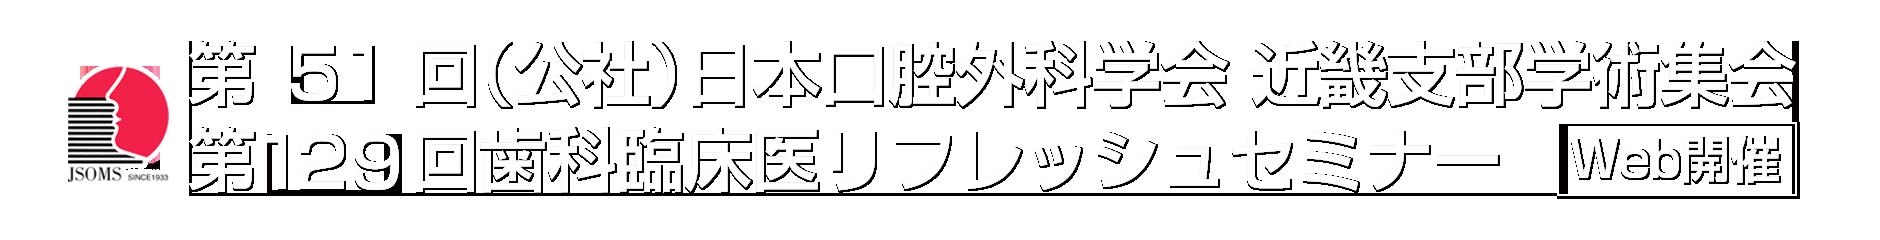 第51回(公社)日本口腔外科学会 近畿支部学術集会/第129回歯科臨床医リフレッシュセミナー